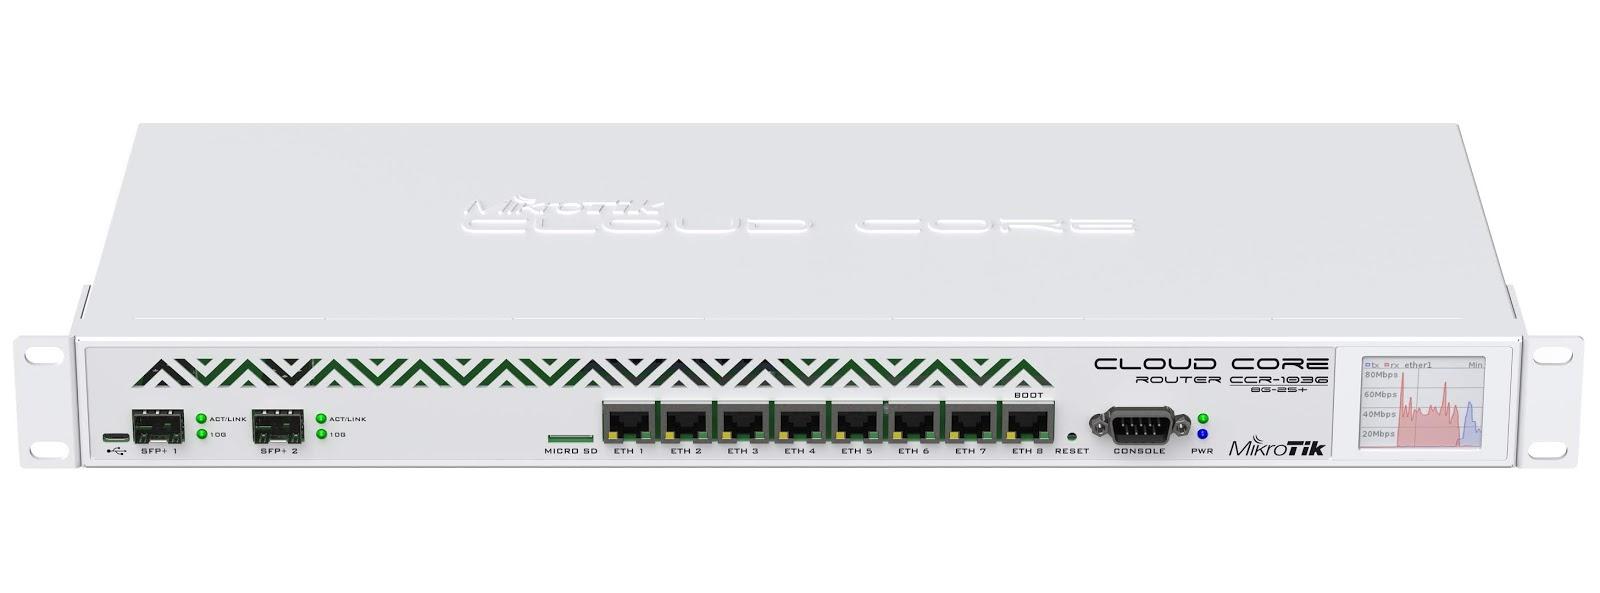 cara configurasi dan cara setting mikrotik dasar wejib konek